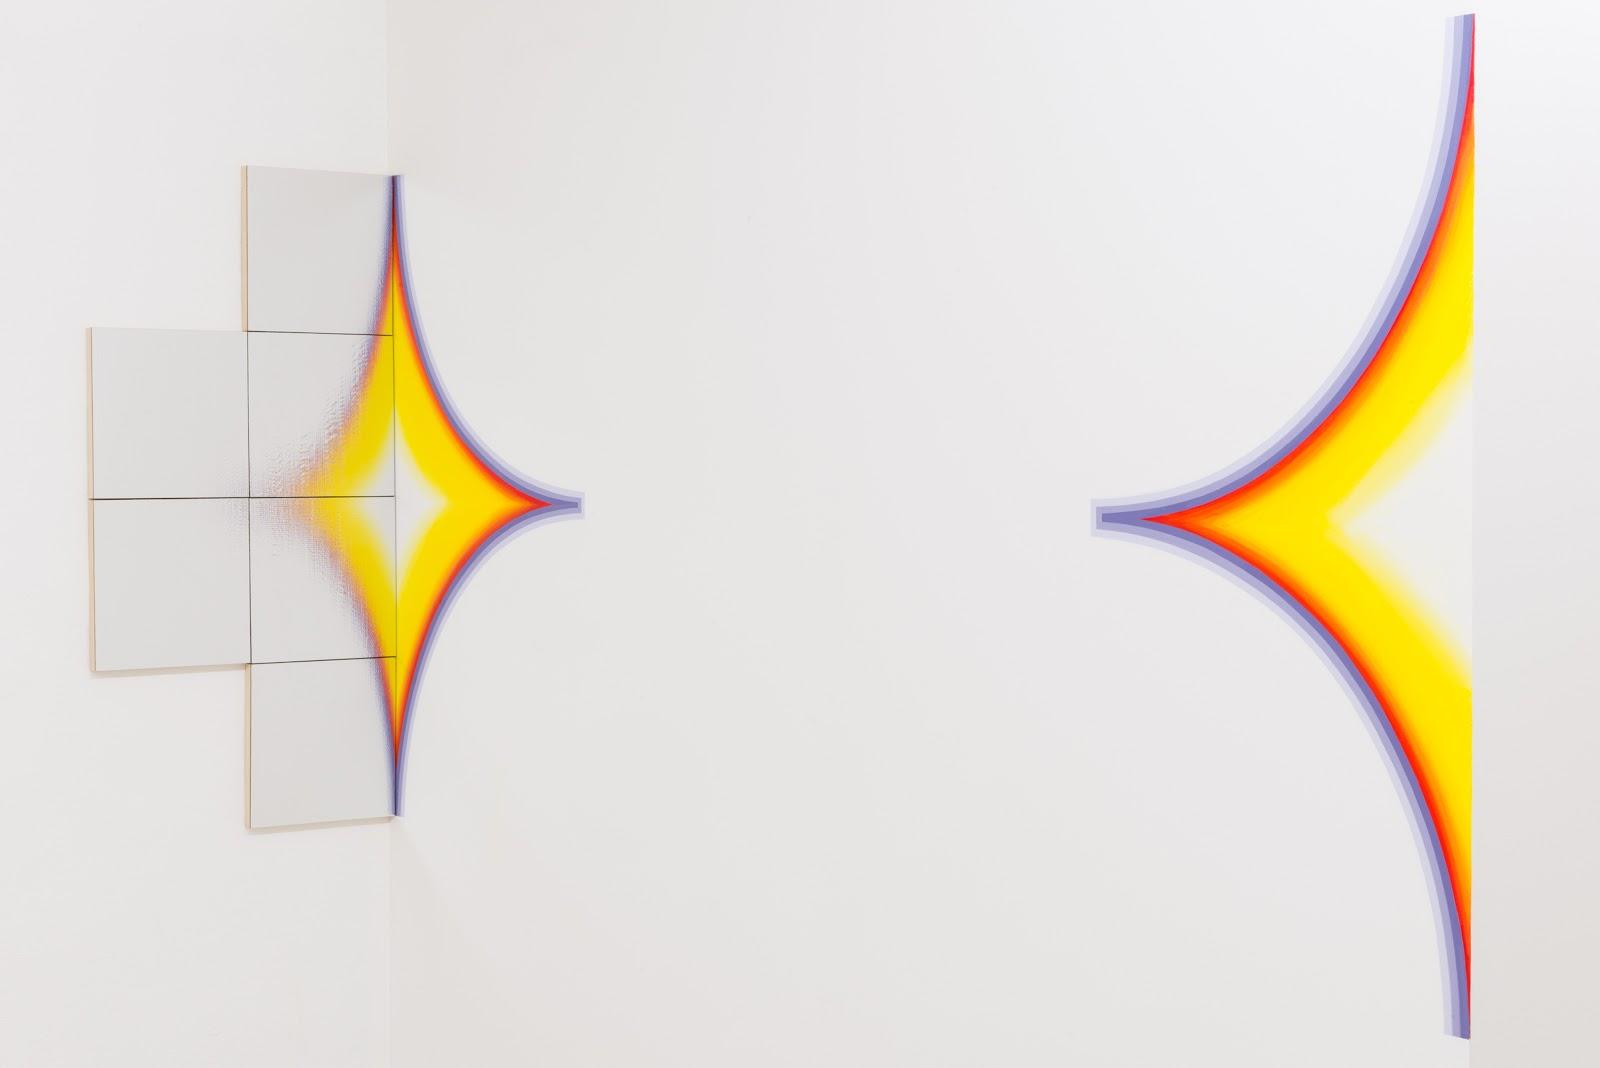 kclog december 2012 lisa beck fort du bruissin centre d art contemporain lyon france